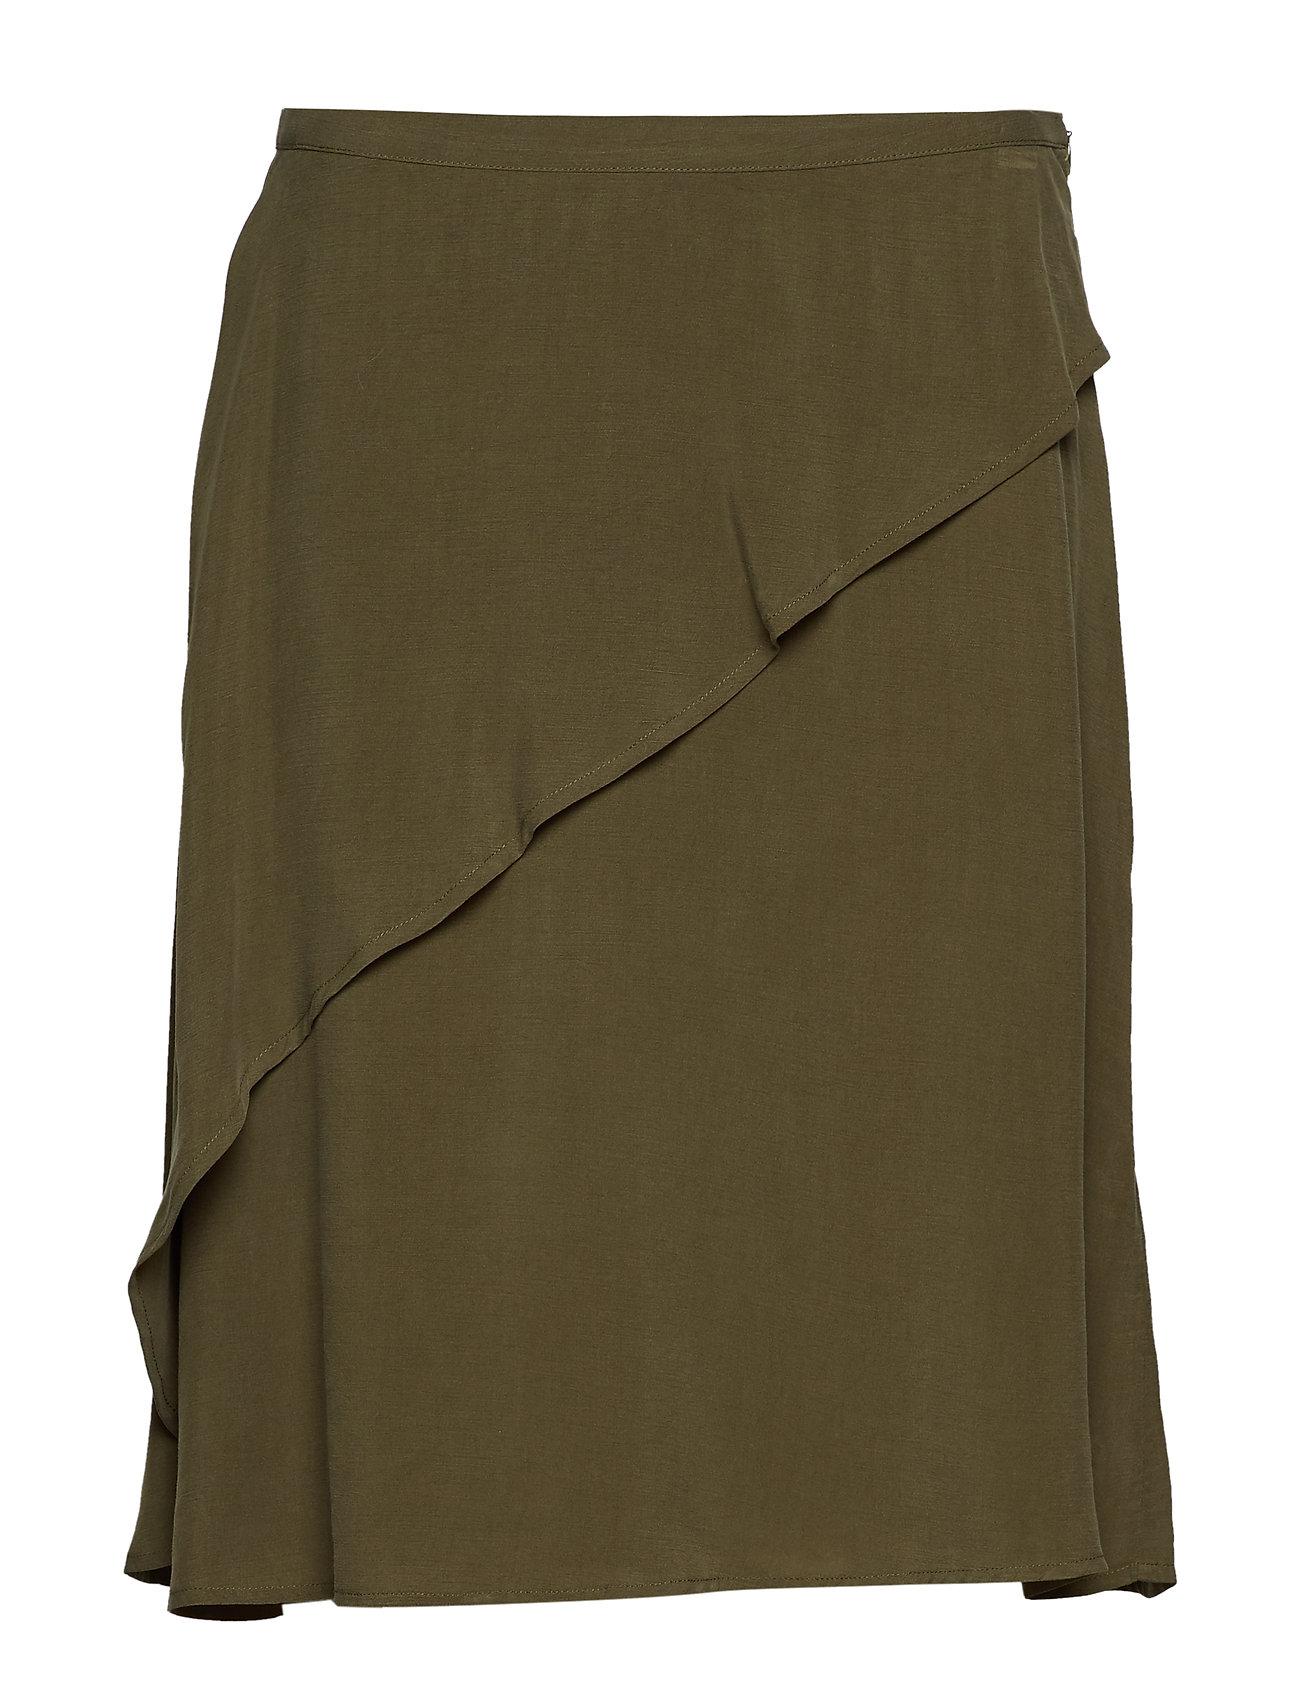 Rabens Saloner Sand washed draped skirt - GREEN